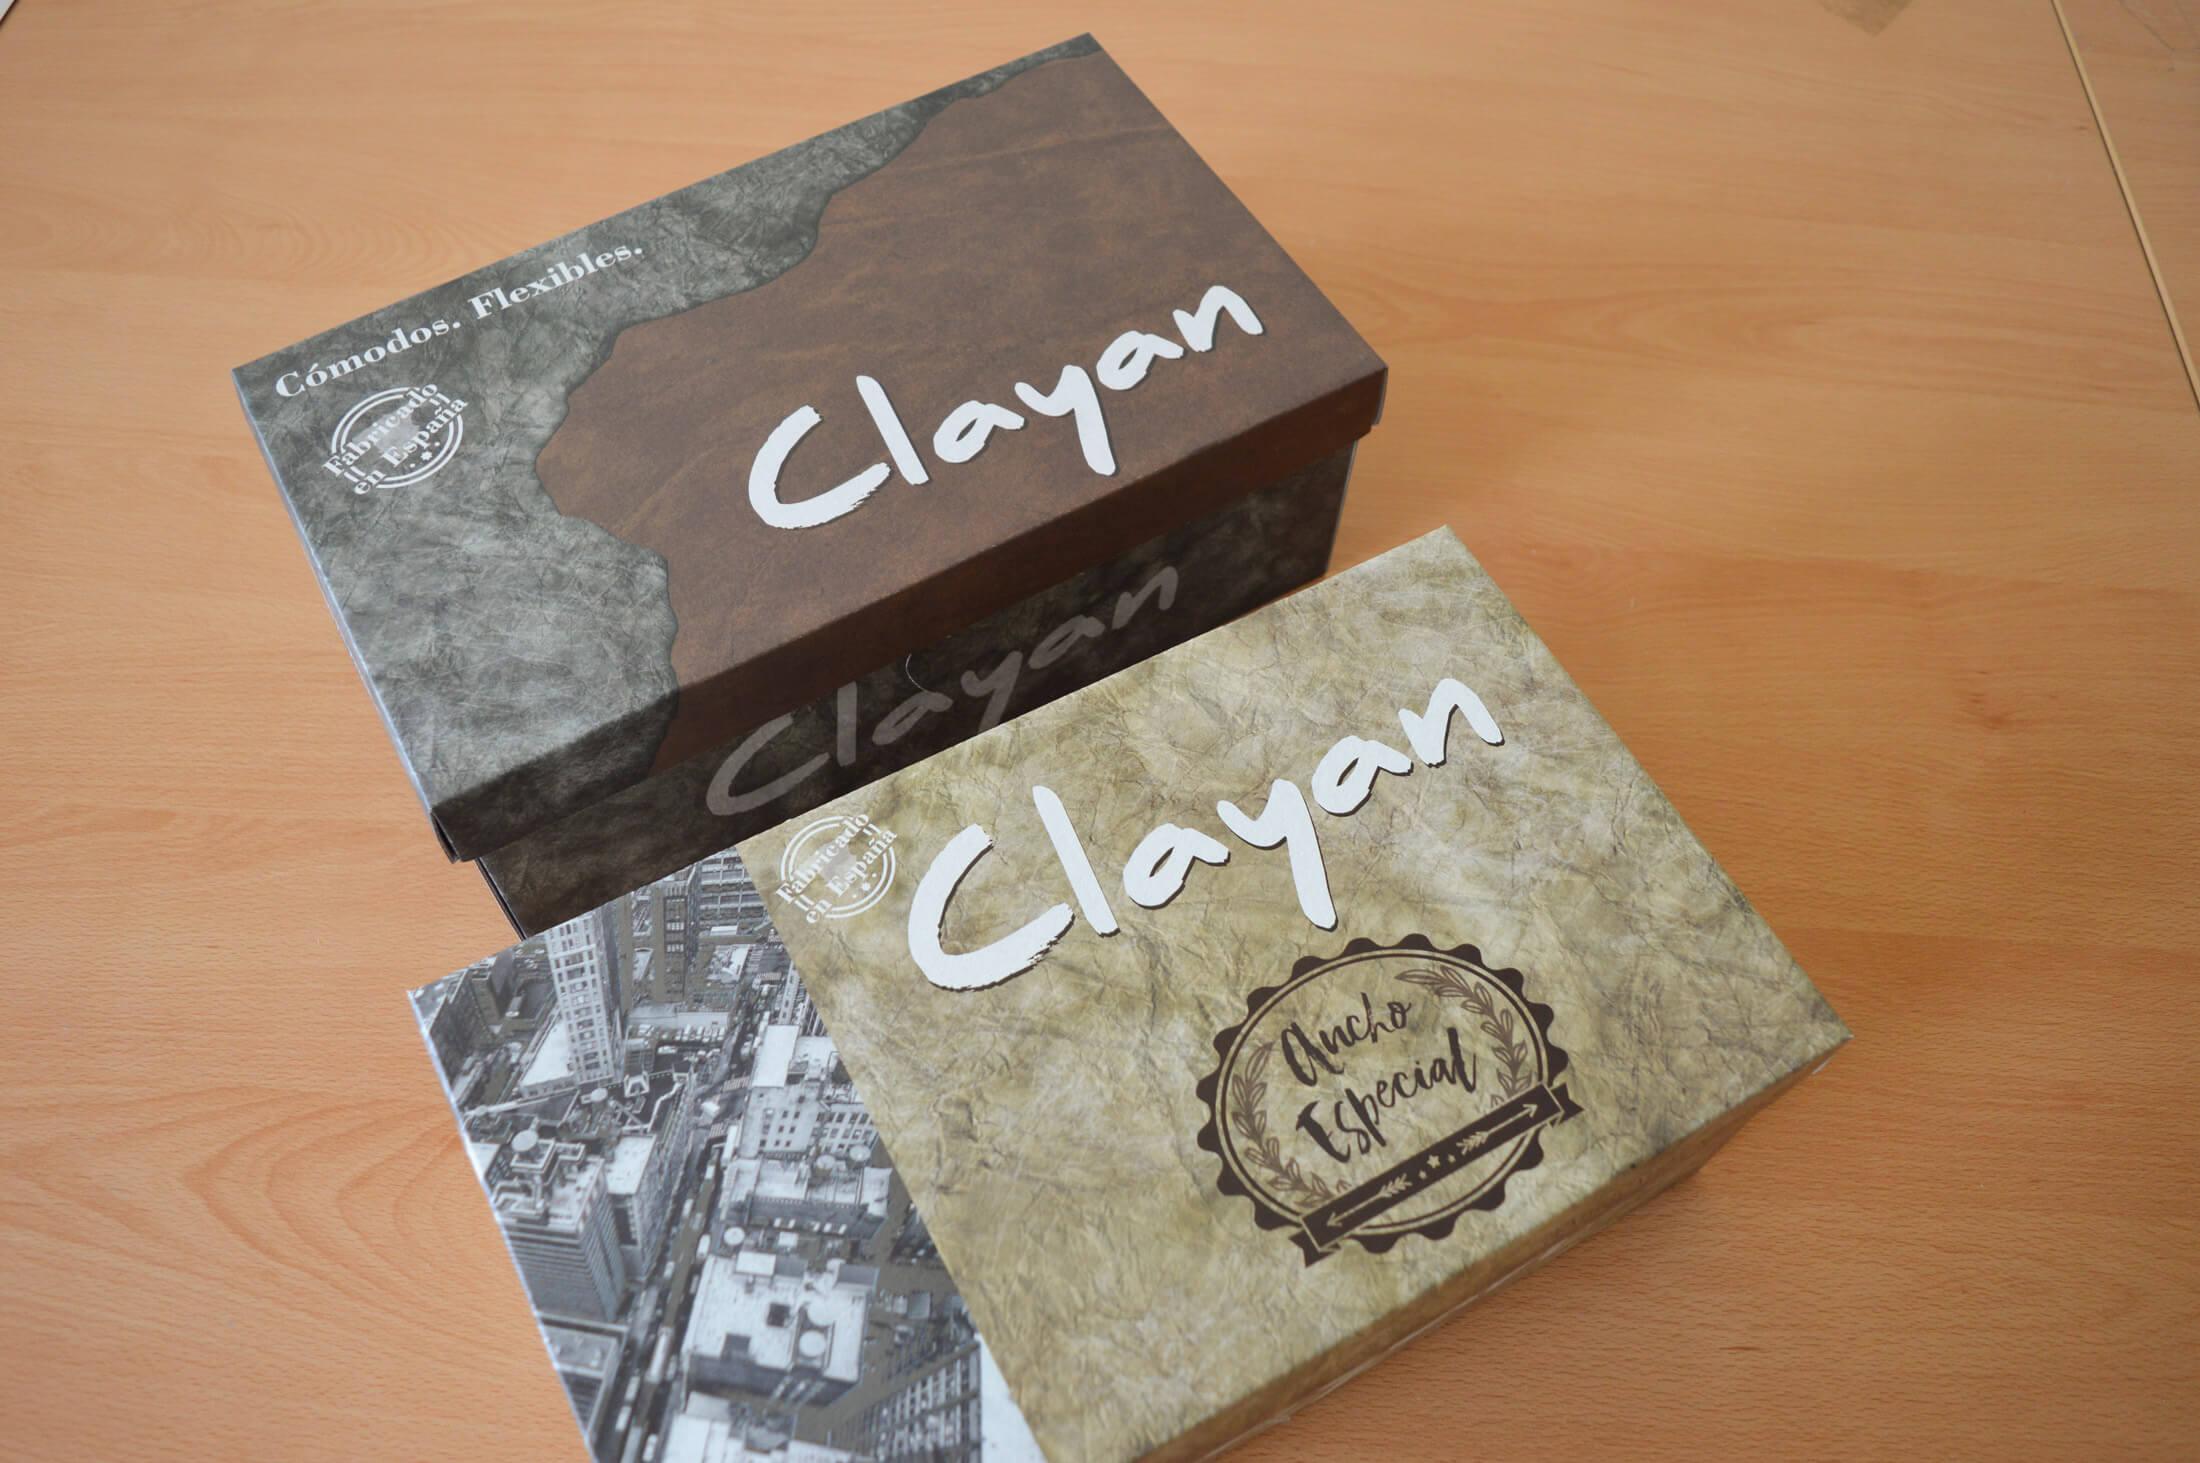 Clayan – 2016